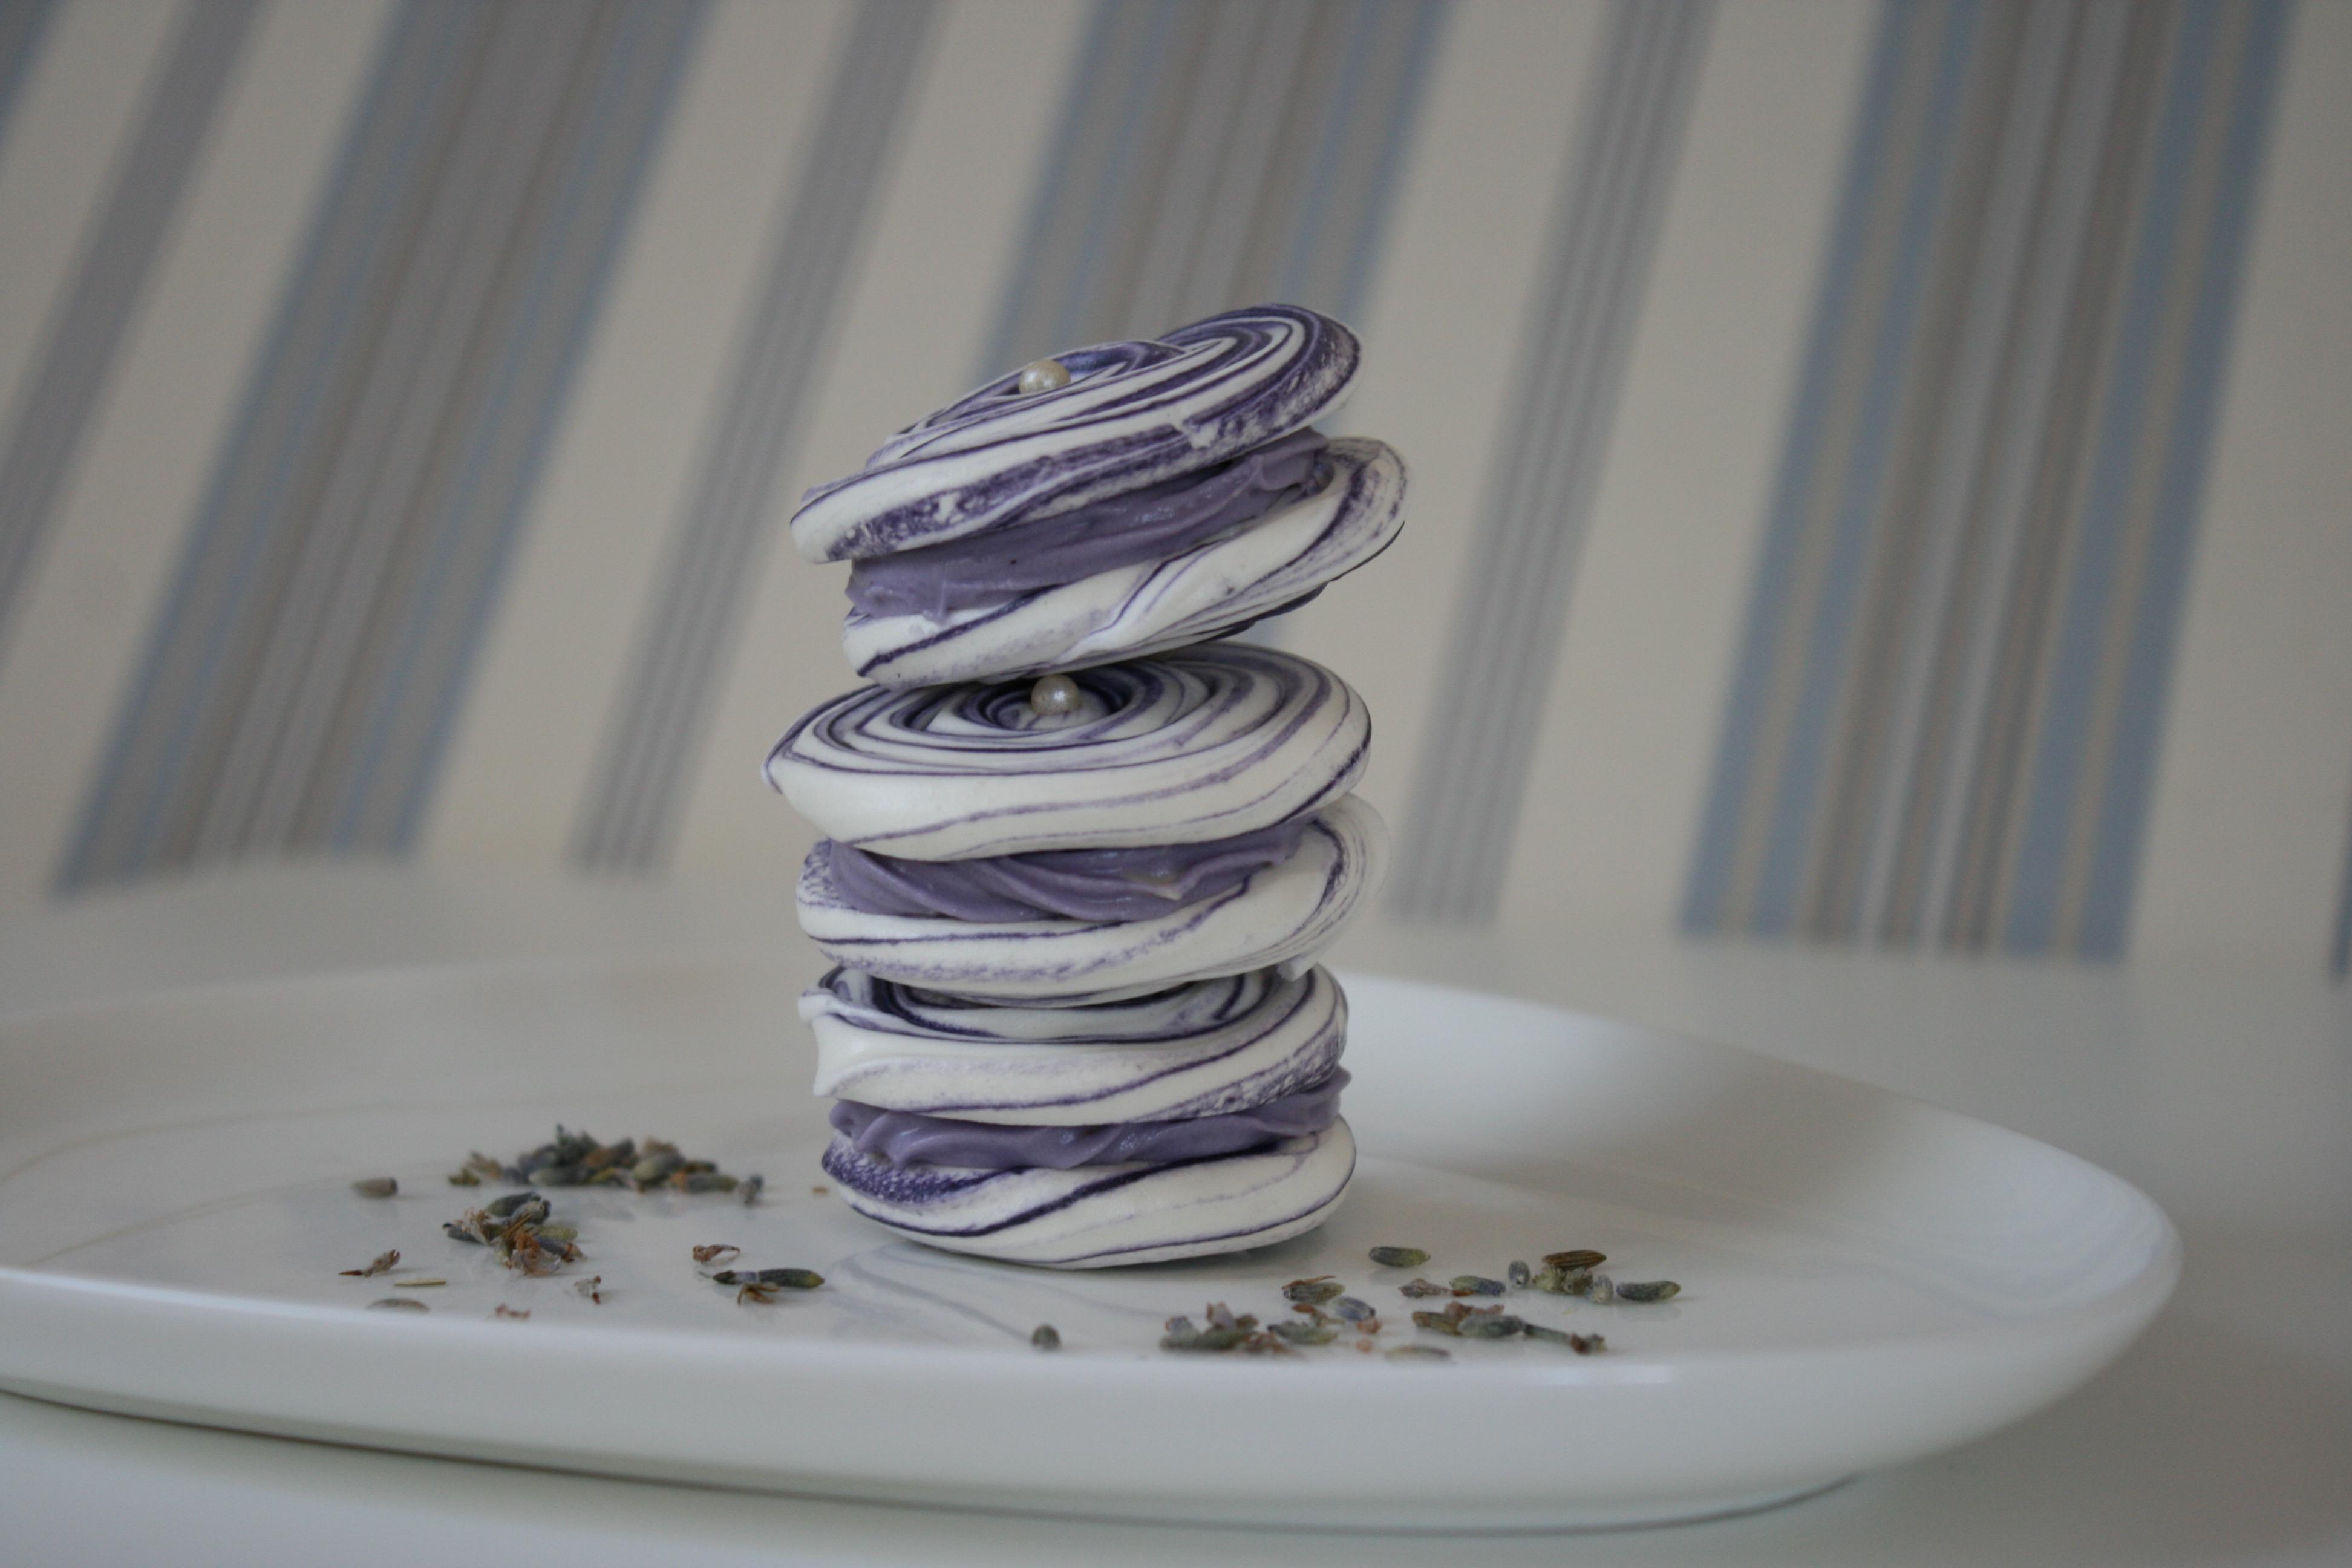 Lavendelmarengs